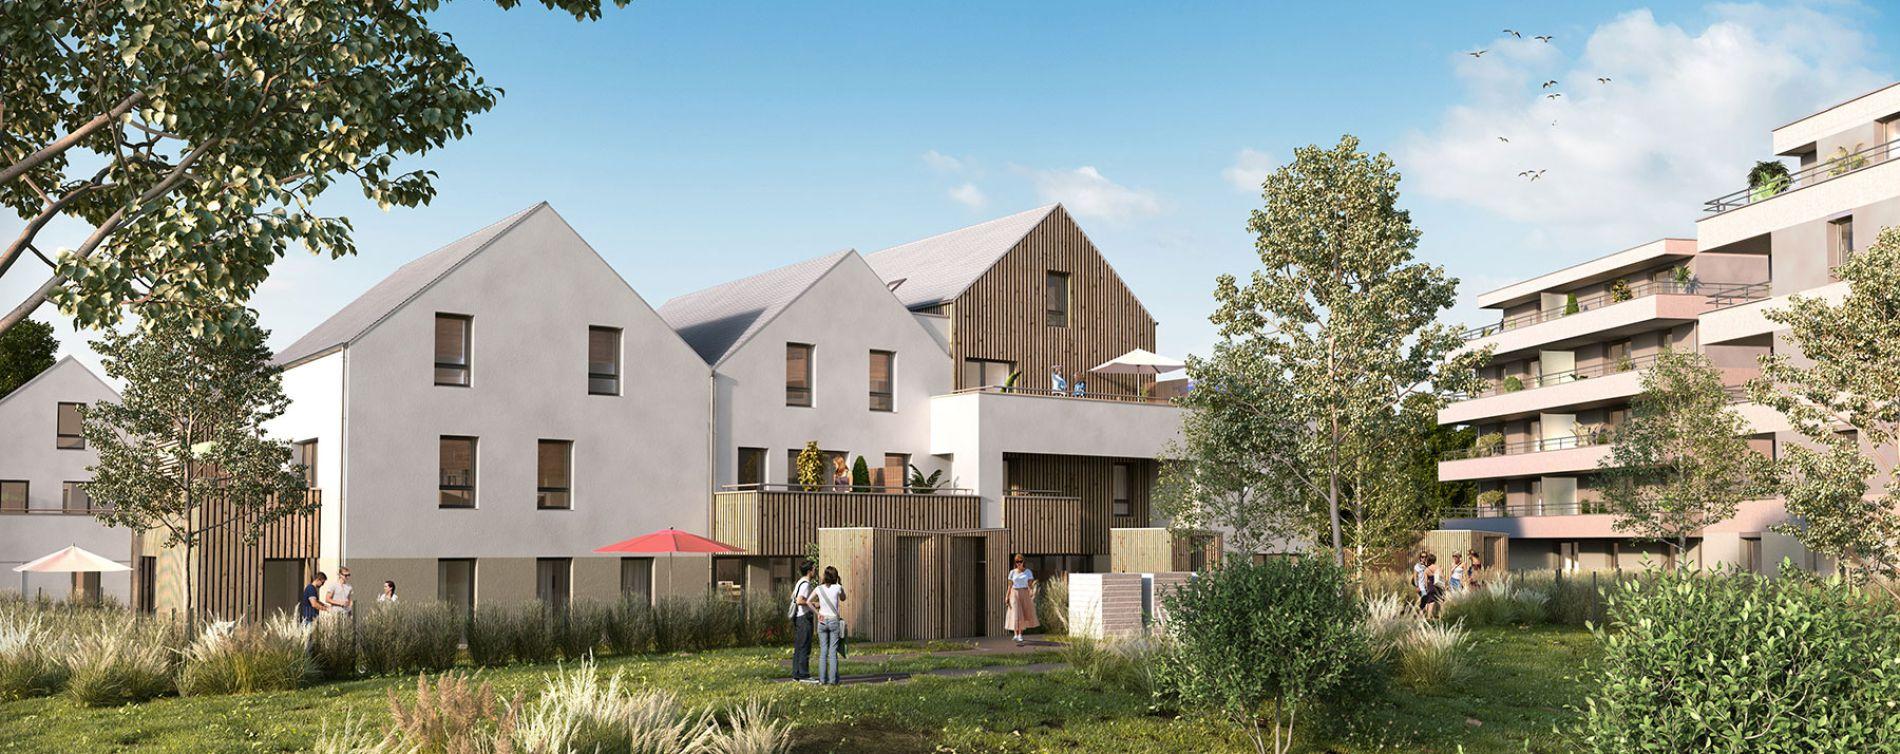 Strasbourg : programme immobilier neuve « Les Moulins Becker » en Loi Pinel